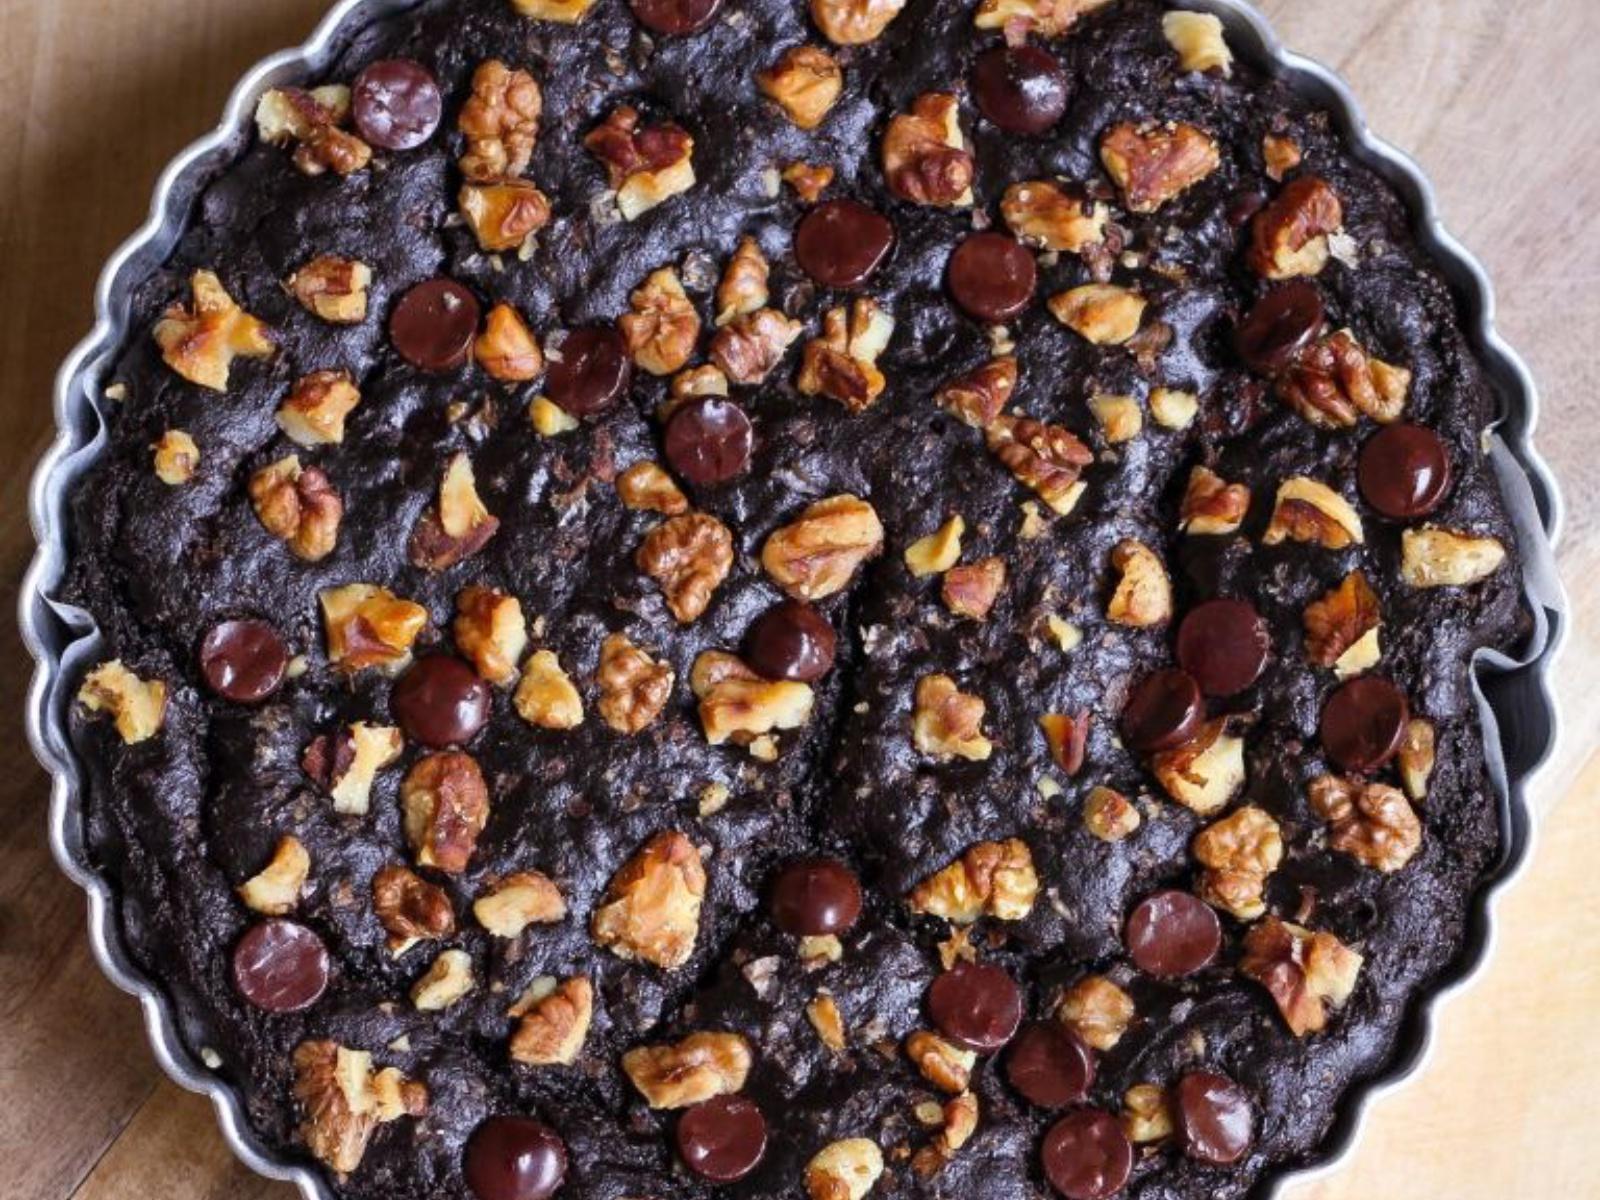 Vegan fudgy chocolate avocado brownies